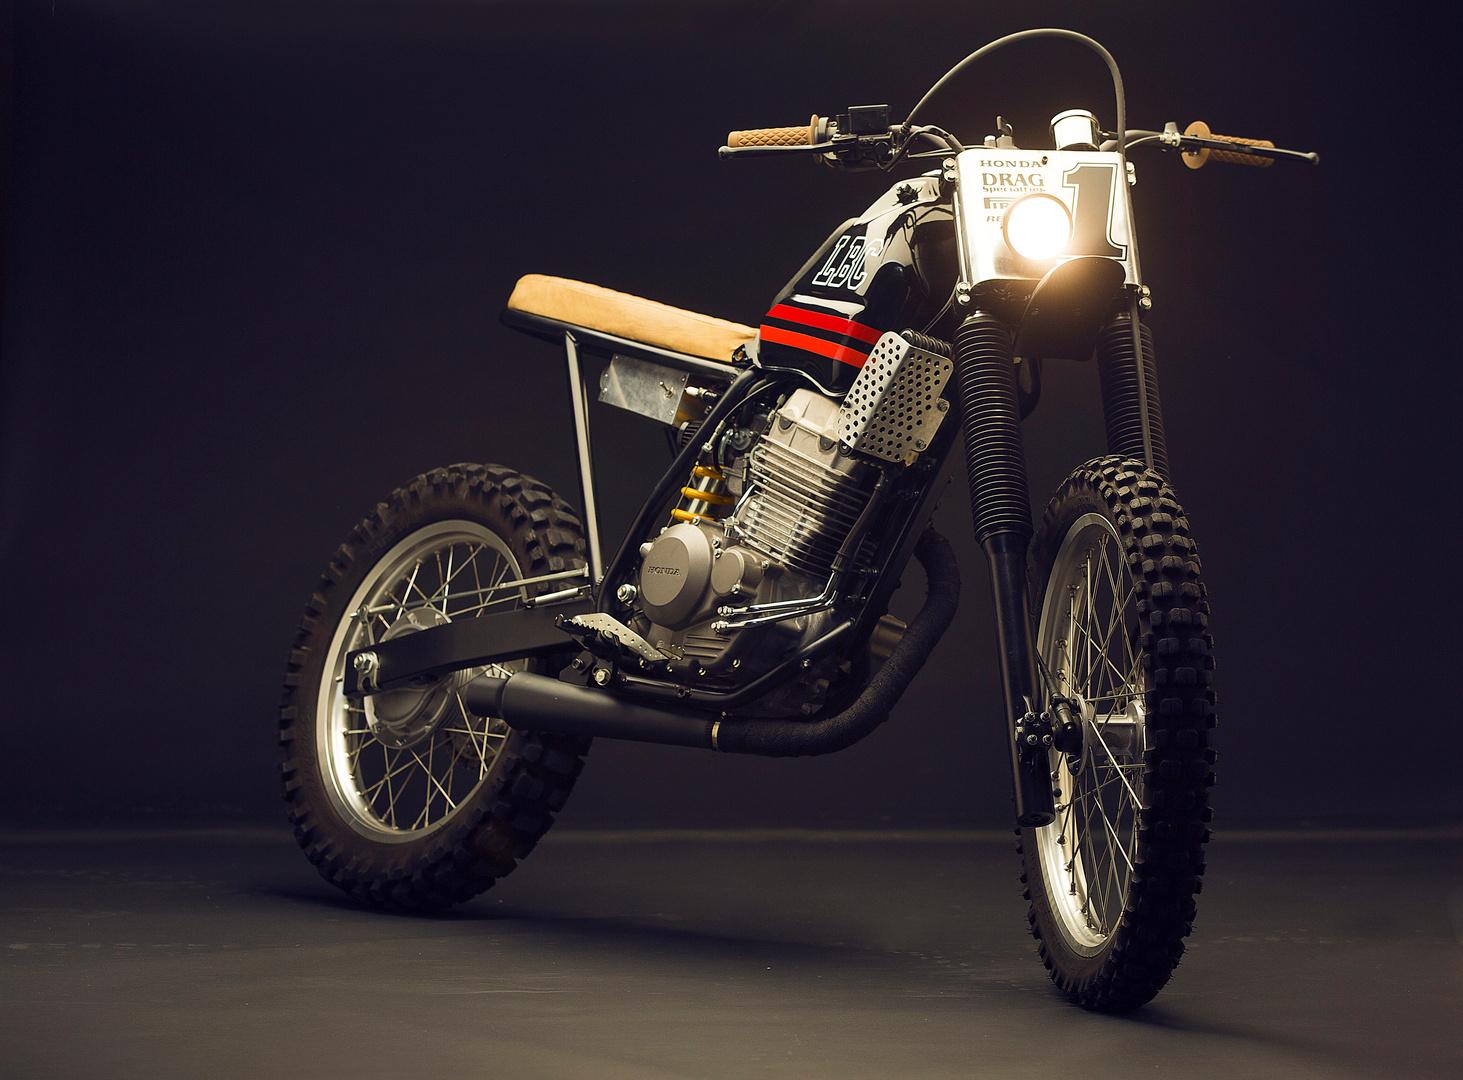 Honda Tornado Street Tracker by Low Budget Customs – BikeBound